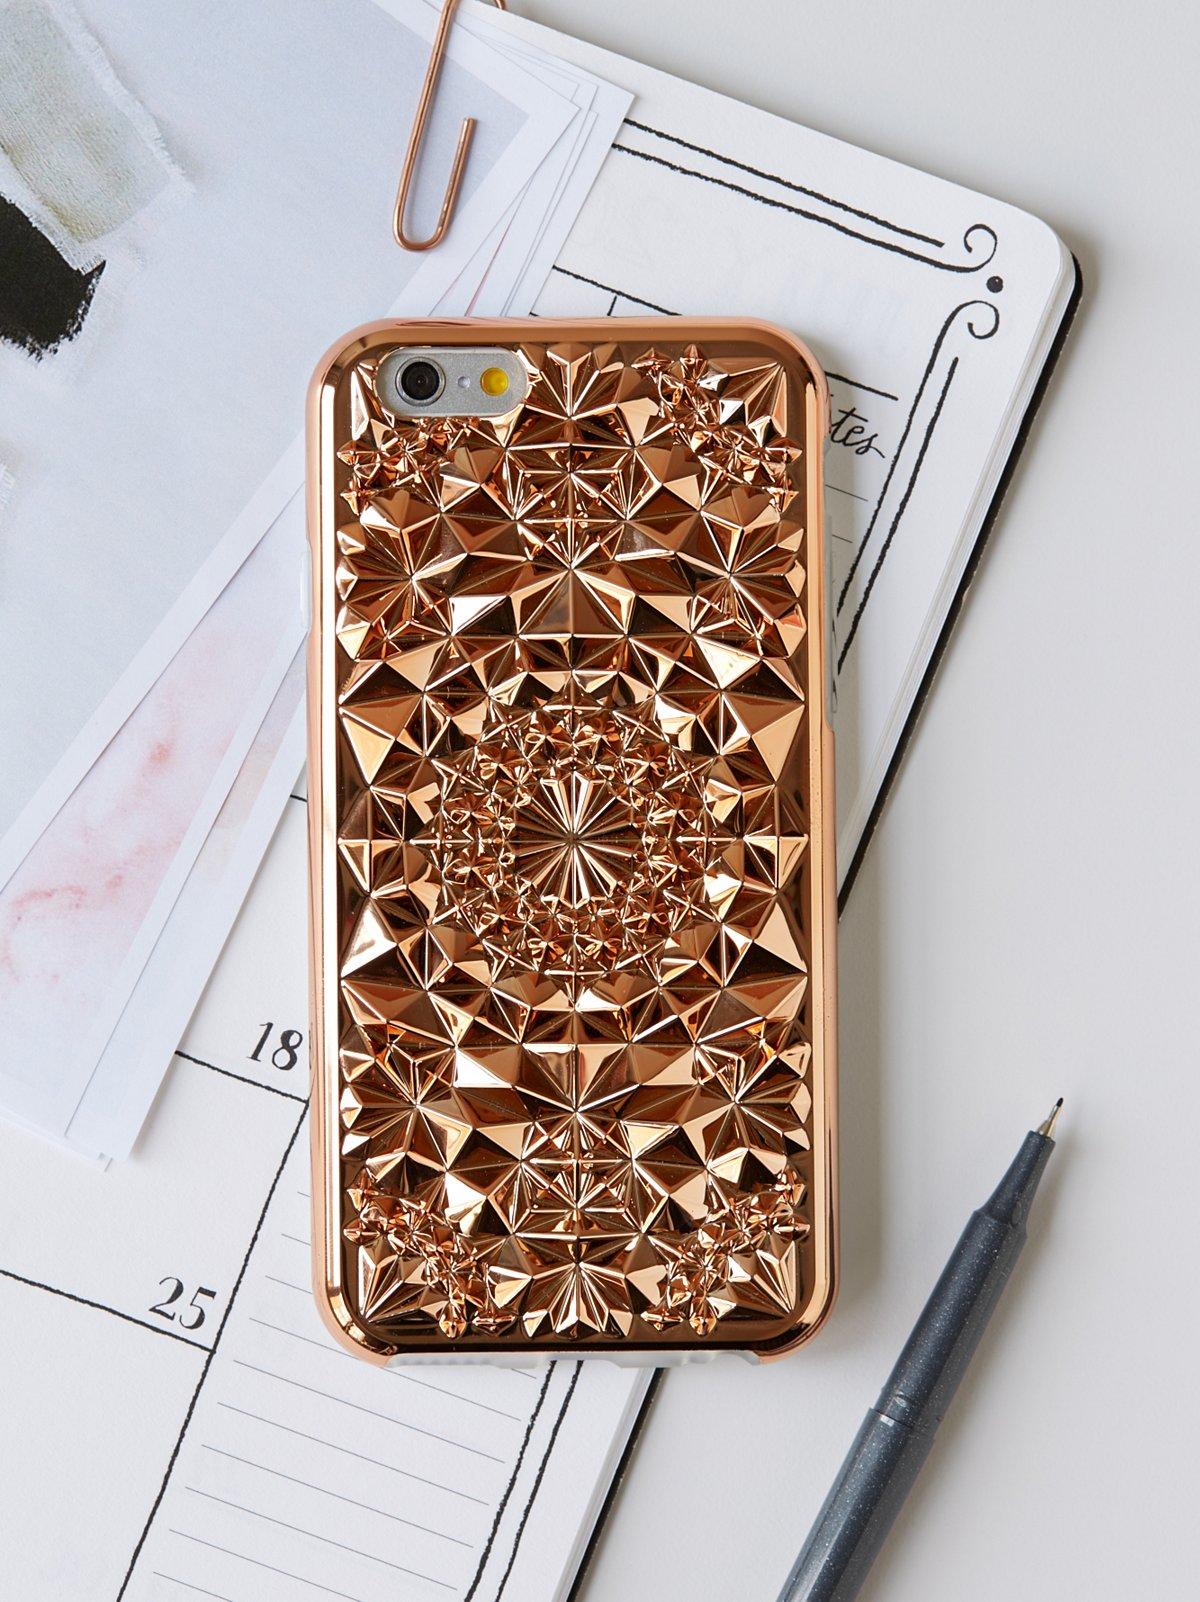 Kaleidoscope iPhone手机壳